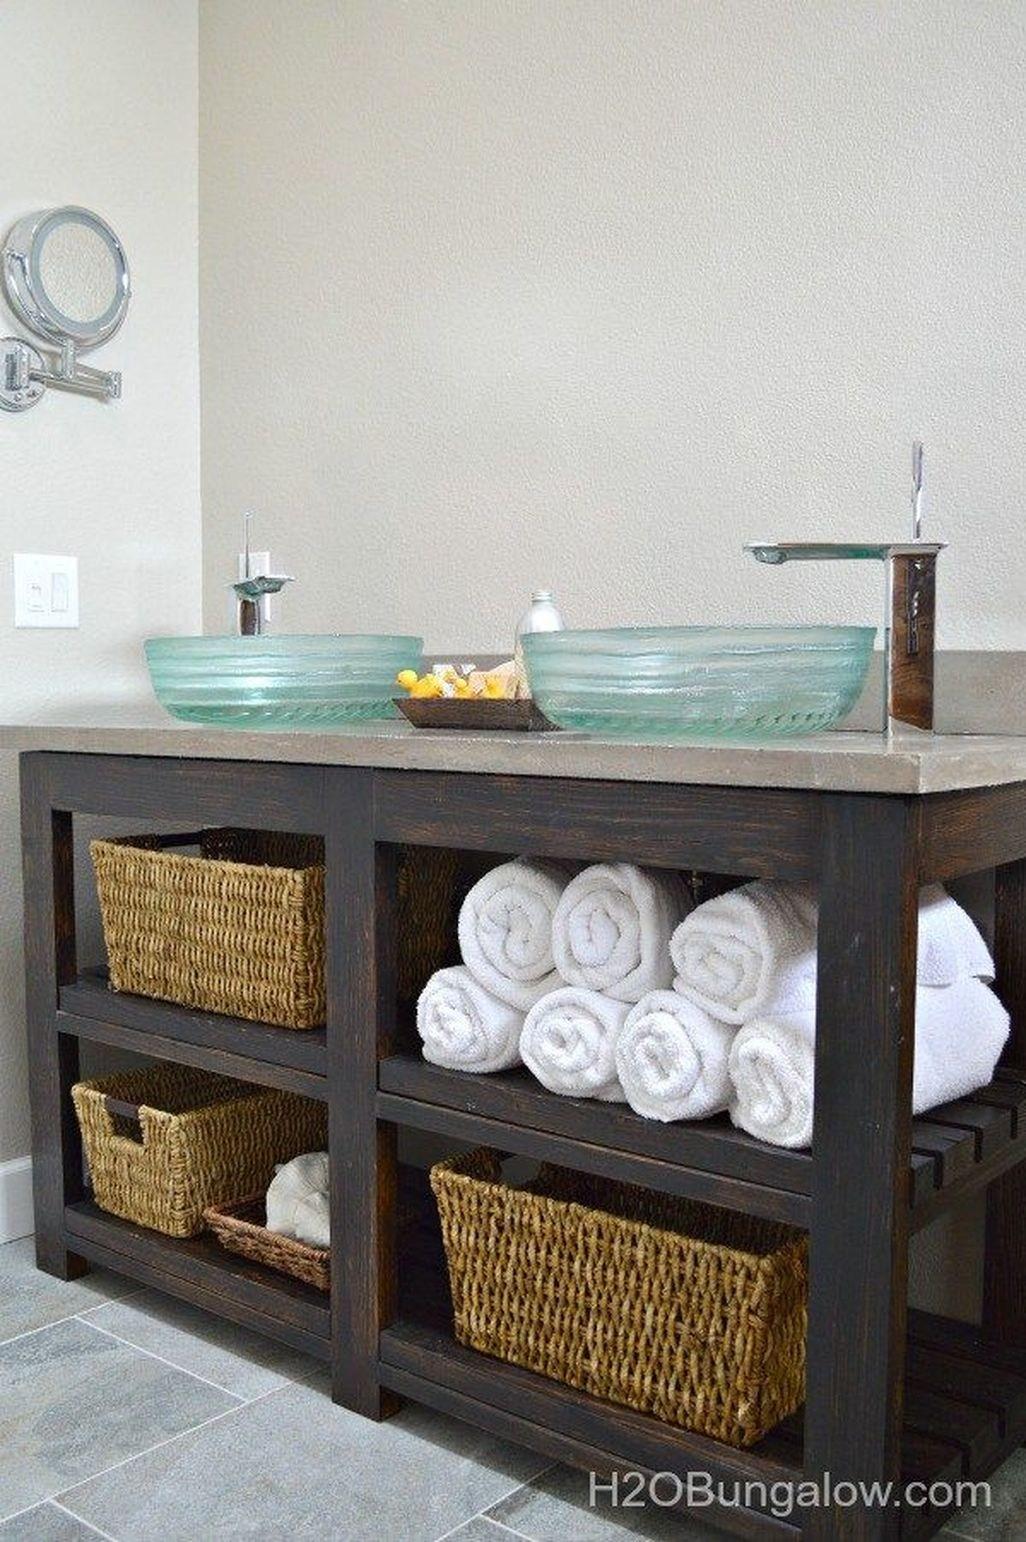 44 Popular Diy Bathroom To Copy Right Now - TREND4HOMY